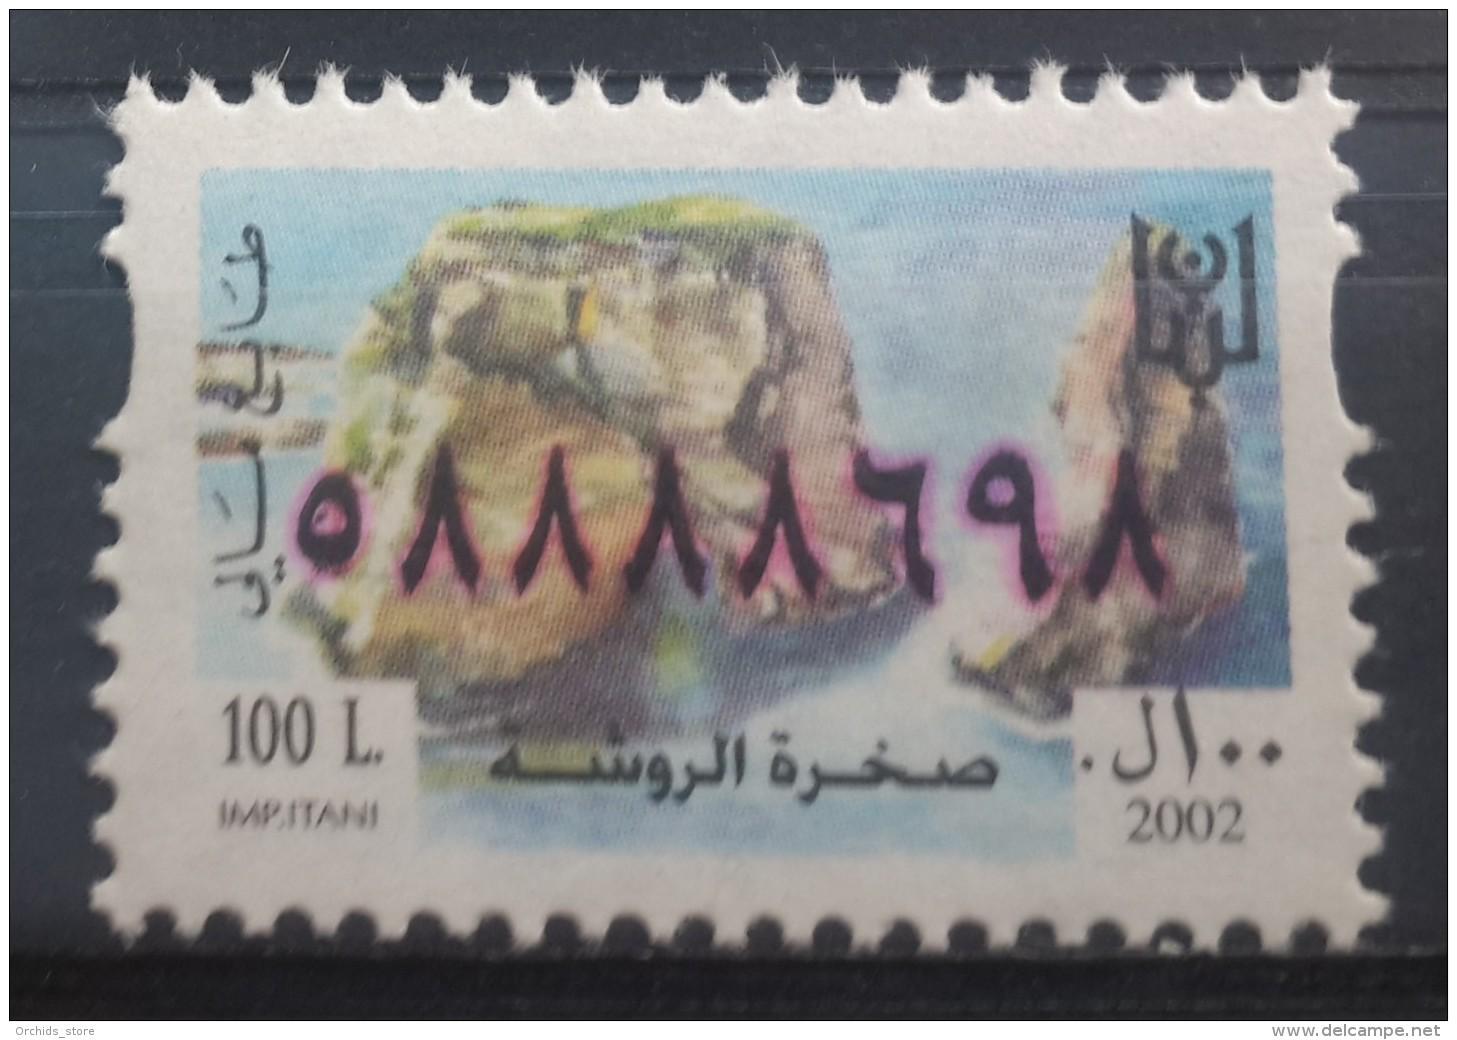 Lebanon 2002 Fiscal Revenue Stamp 100 L - MNH - Rock Of Raoucheh - Lebanon